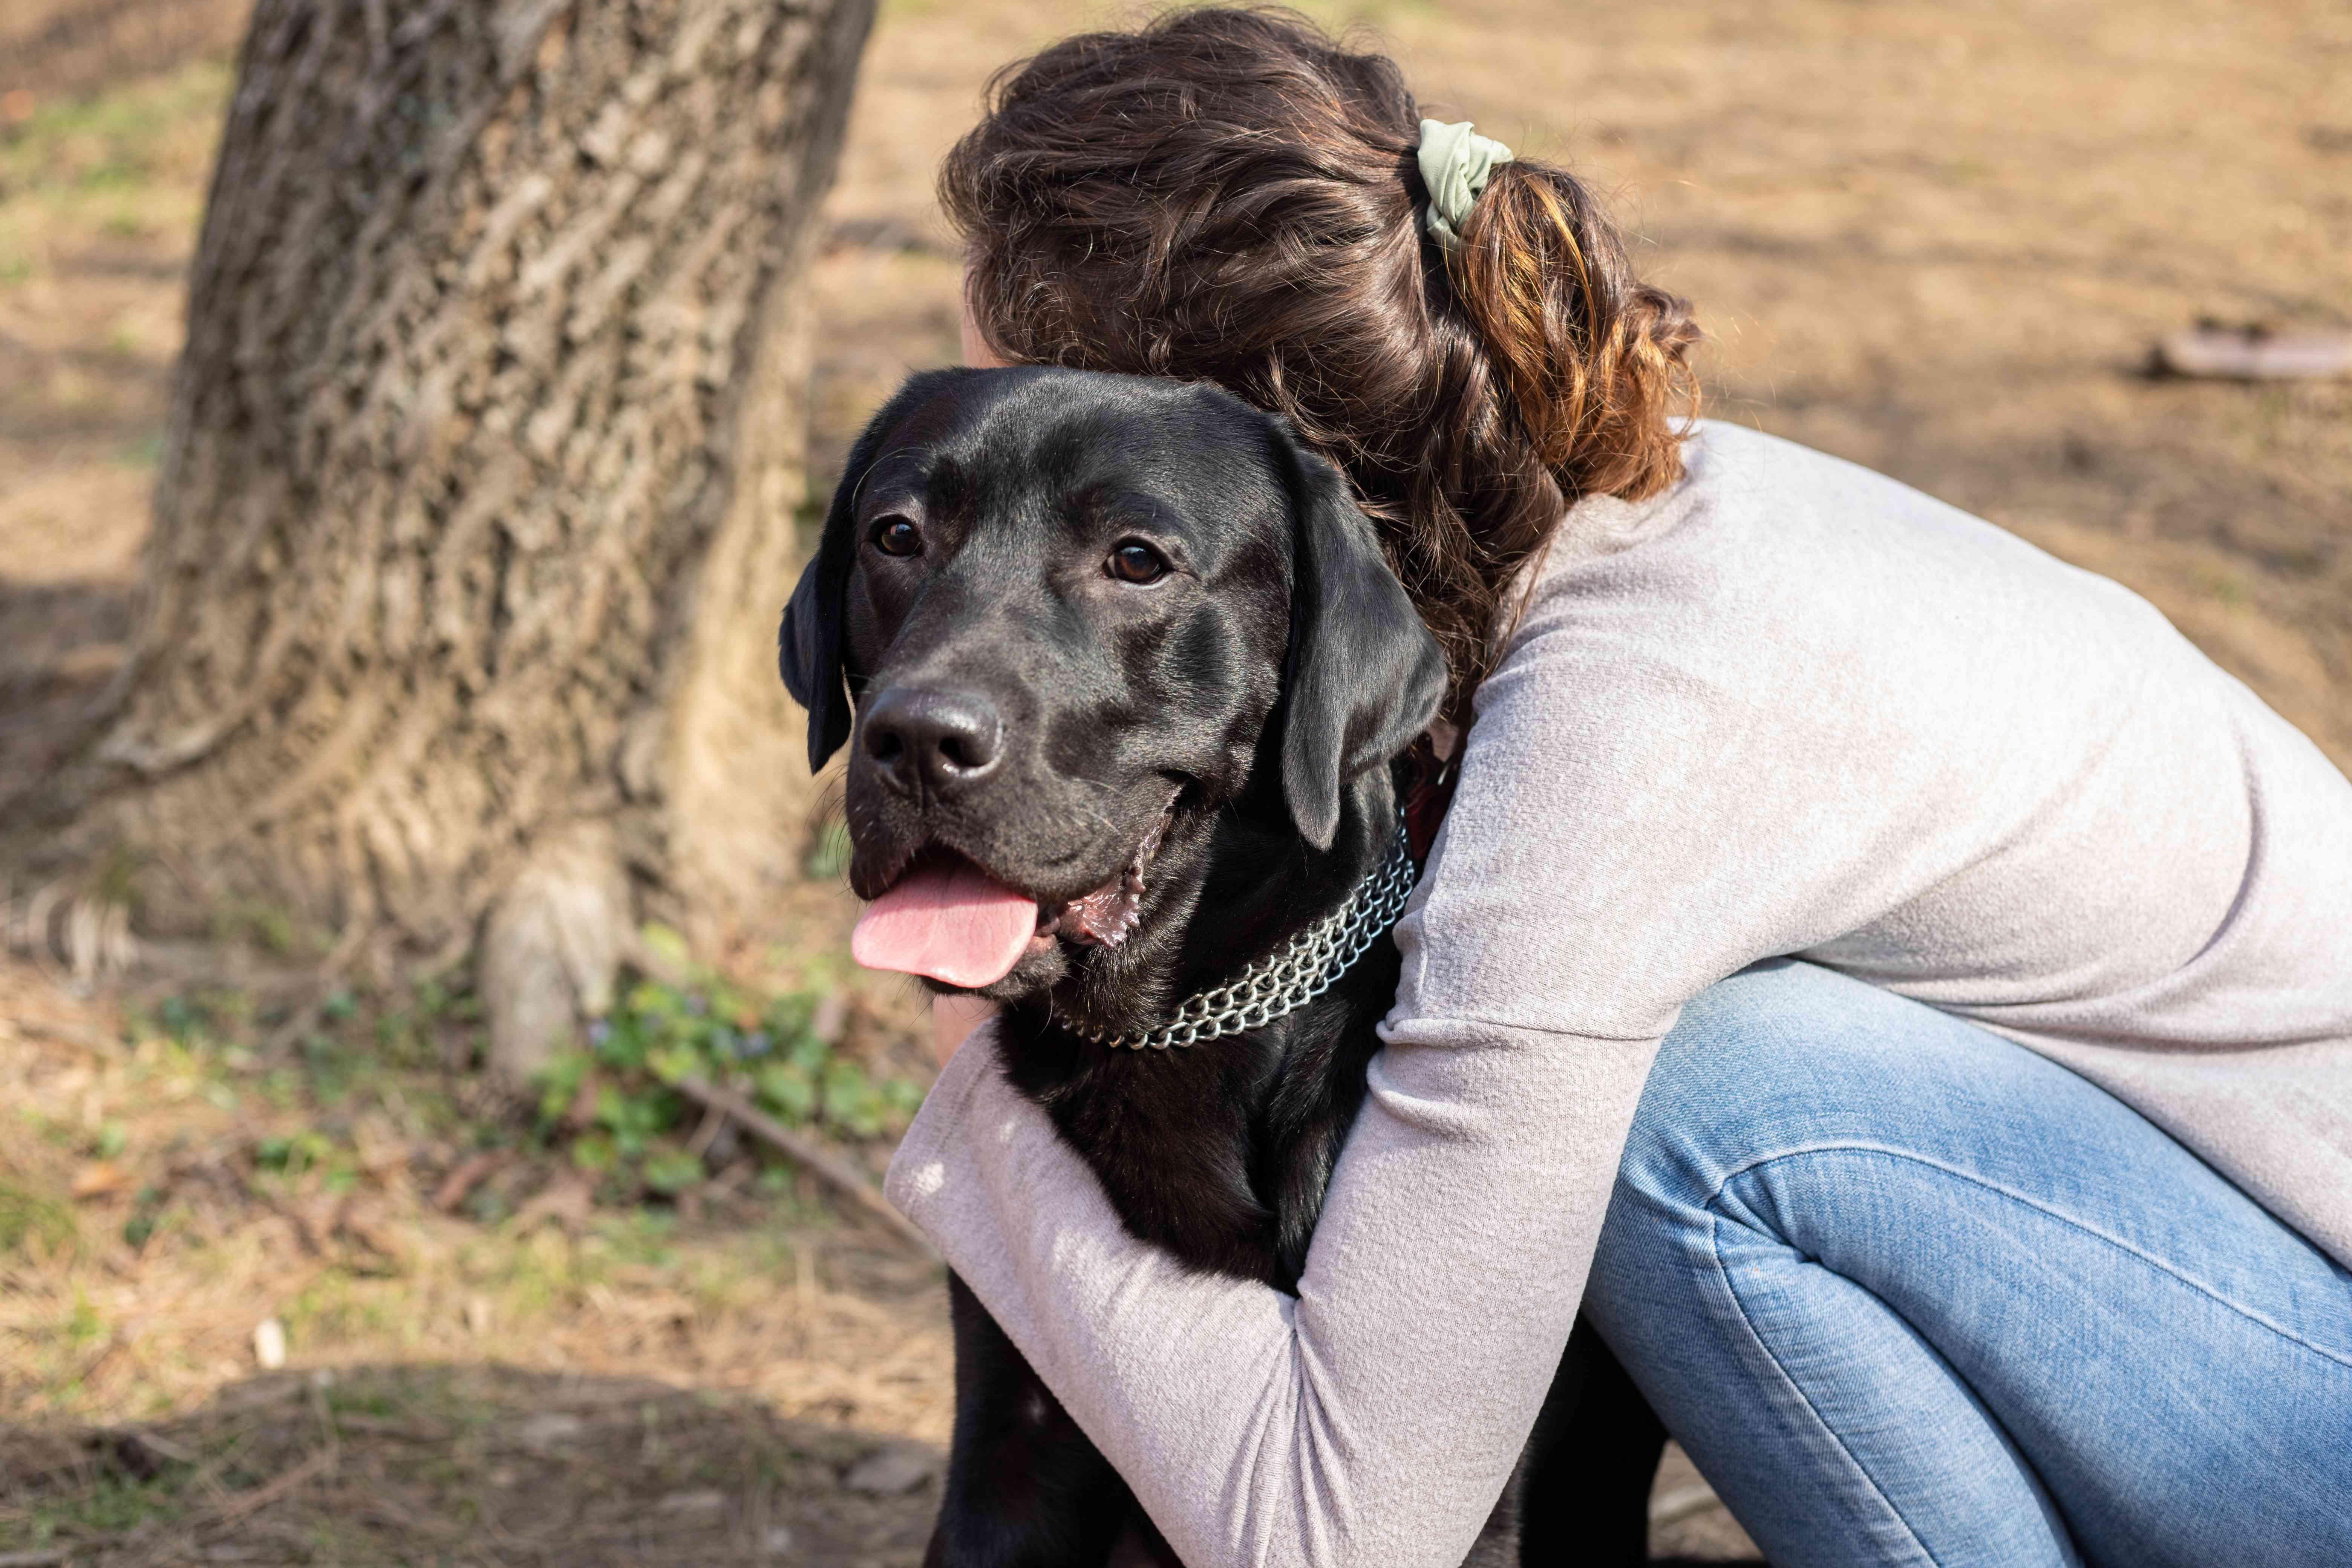 woman hugs black dog outside near a tree